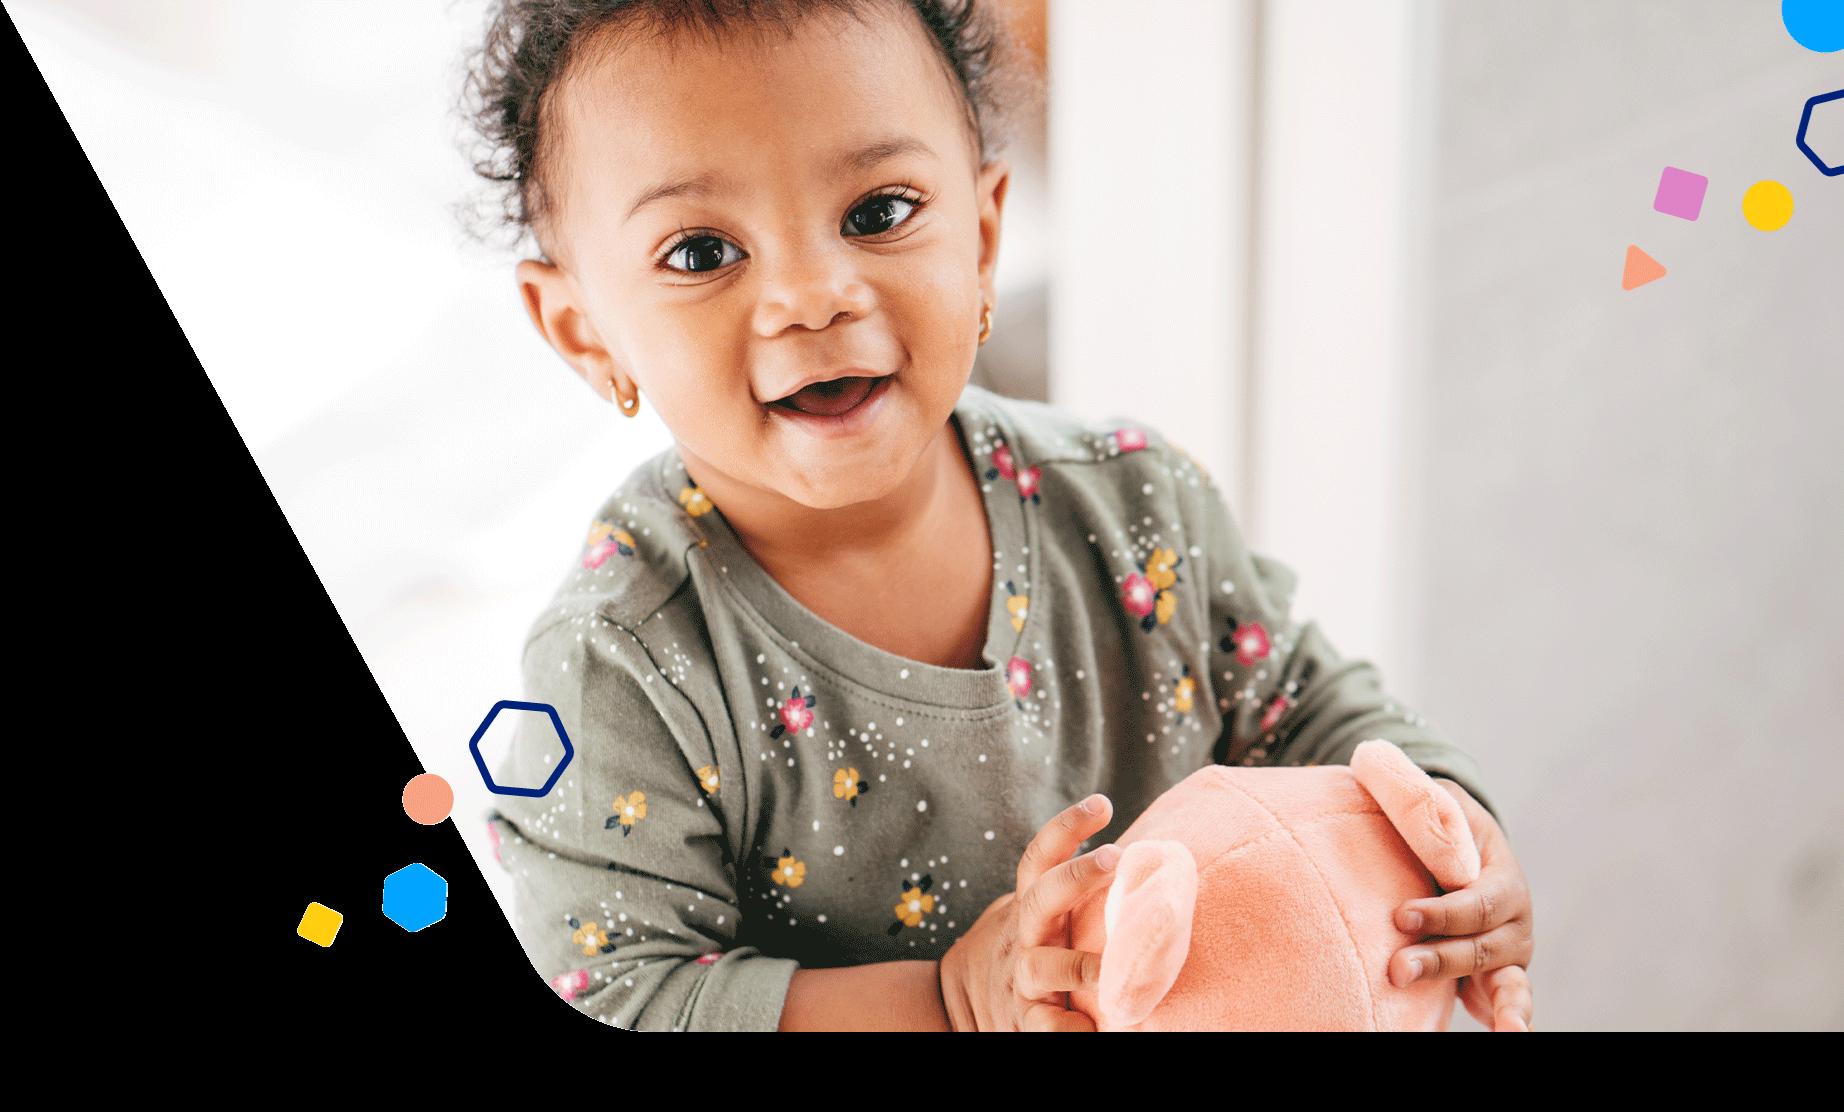 Enfagrow Toddler Next Step DHA and Your Toddler